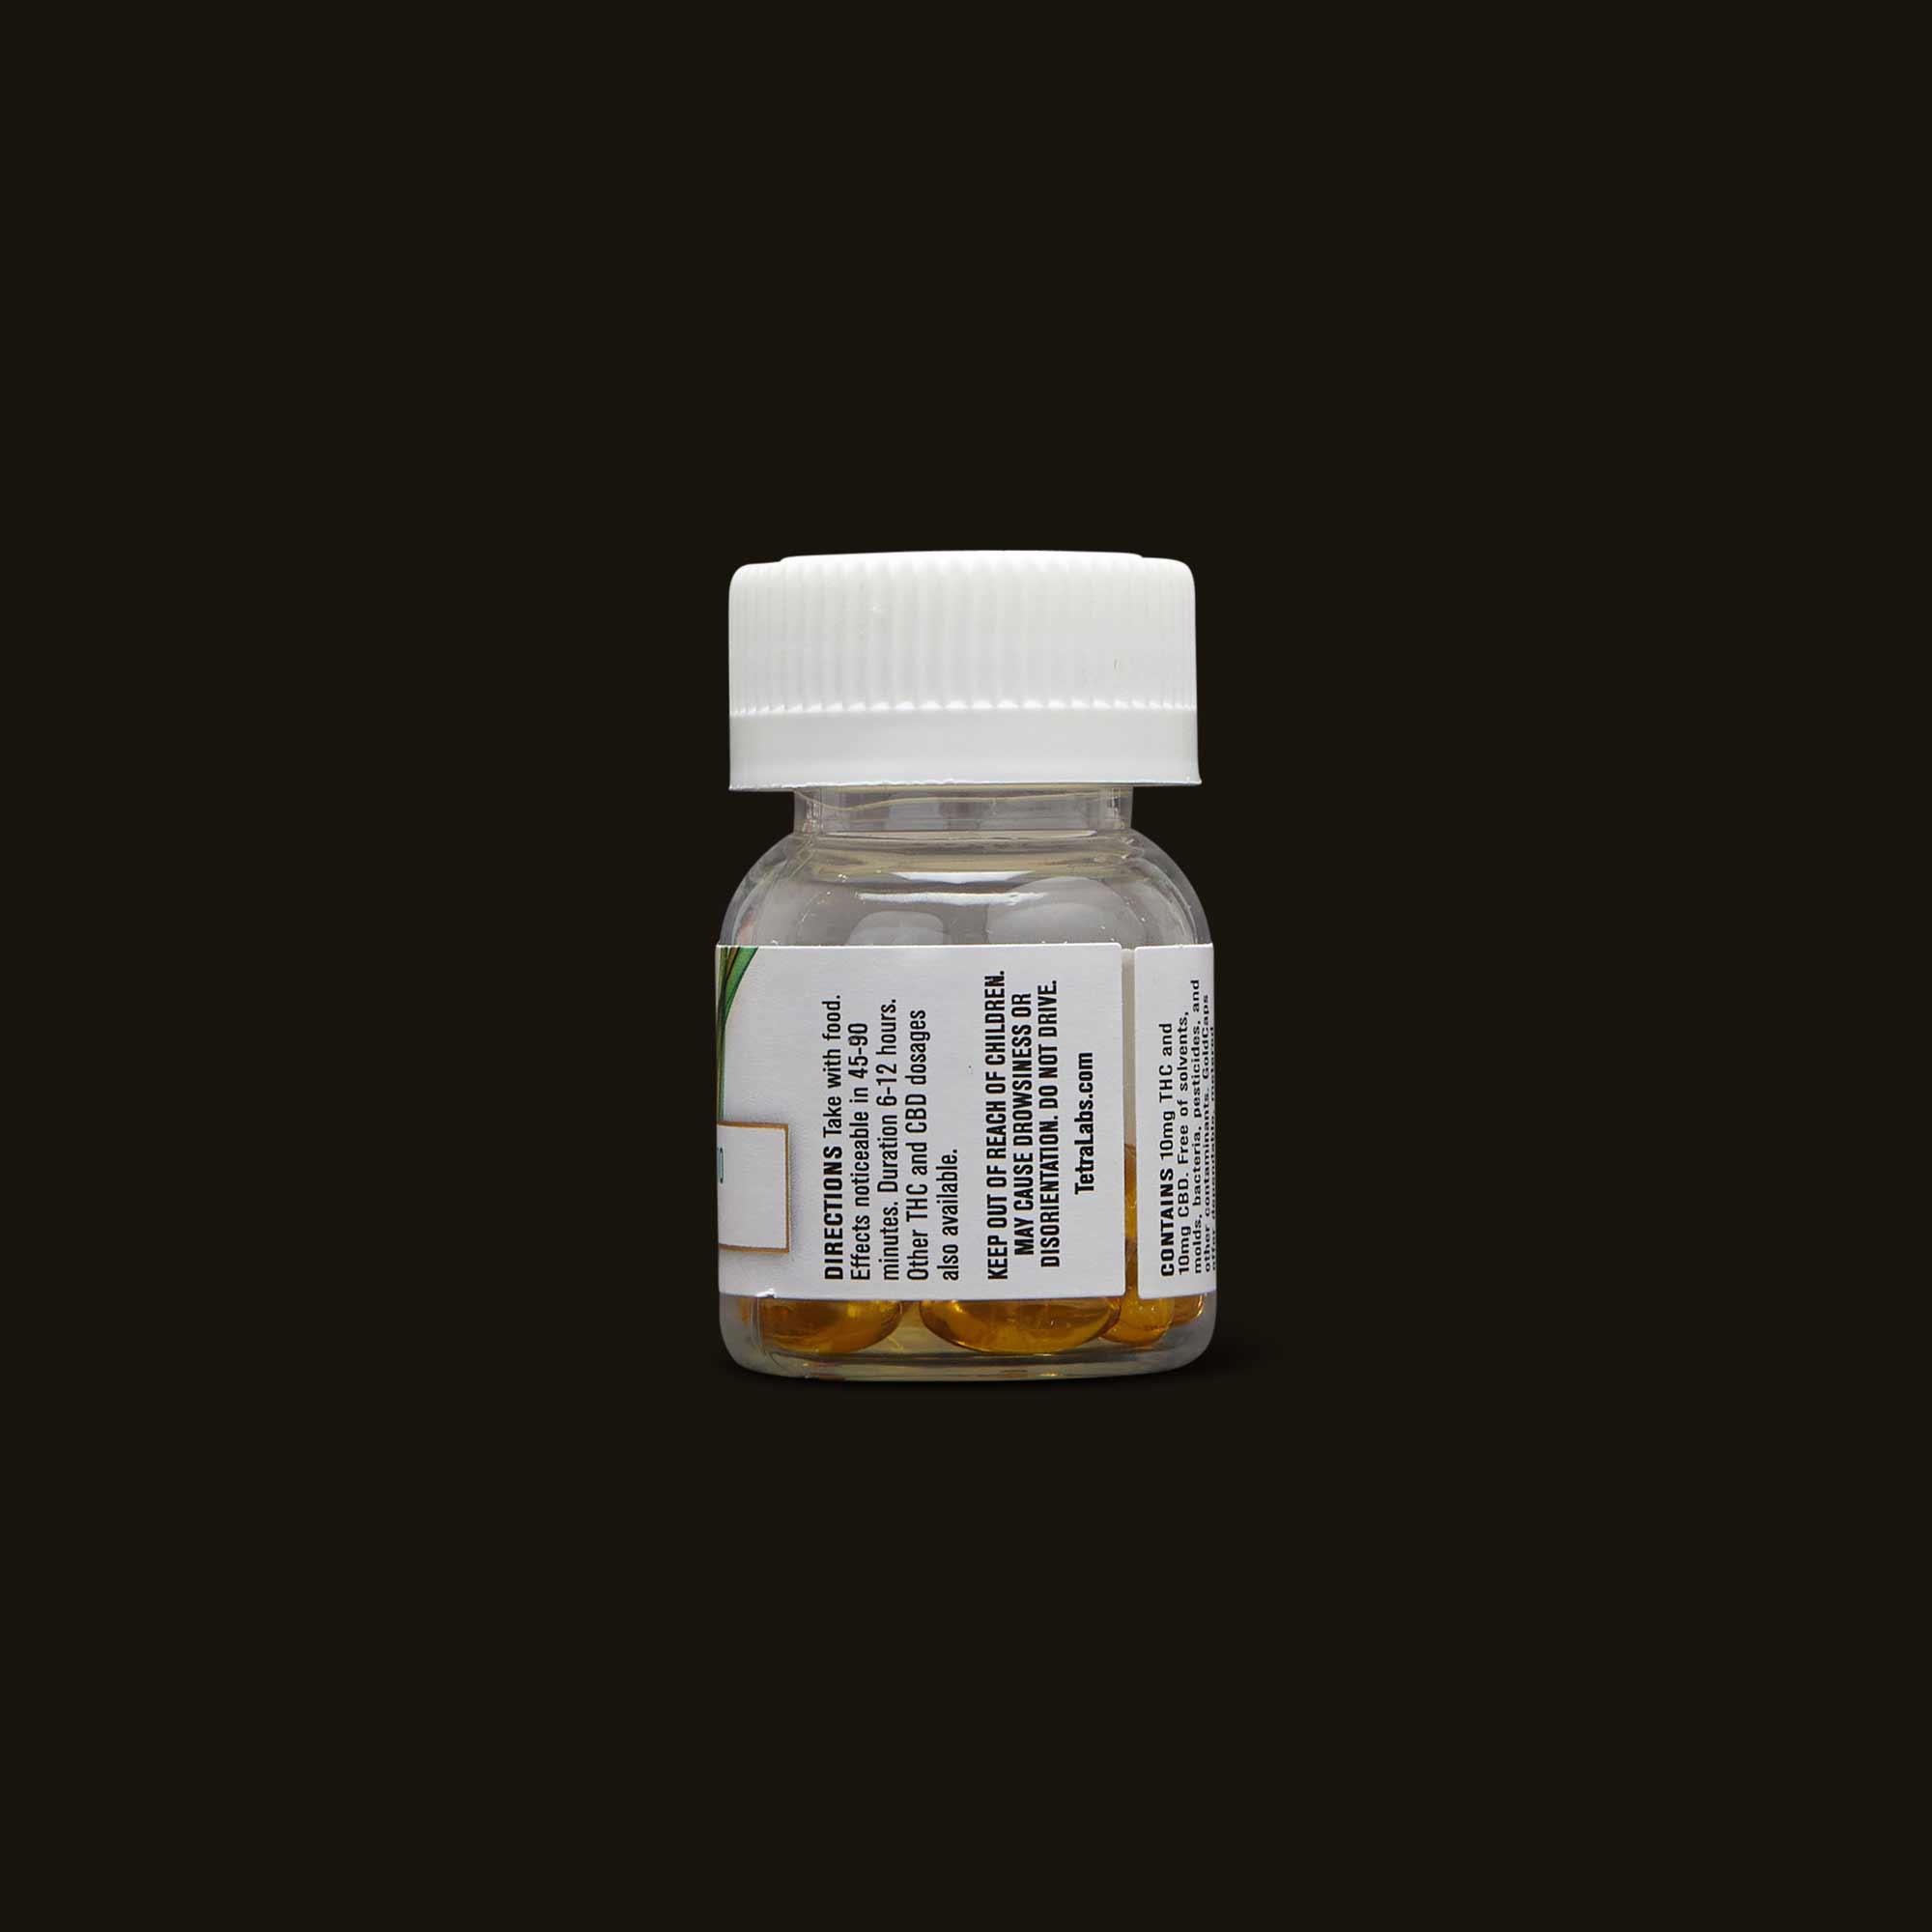 1:1 THC:CBD GoldCaps by TetraLabs